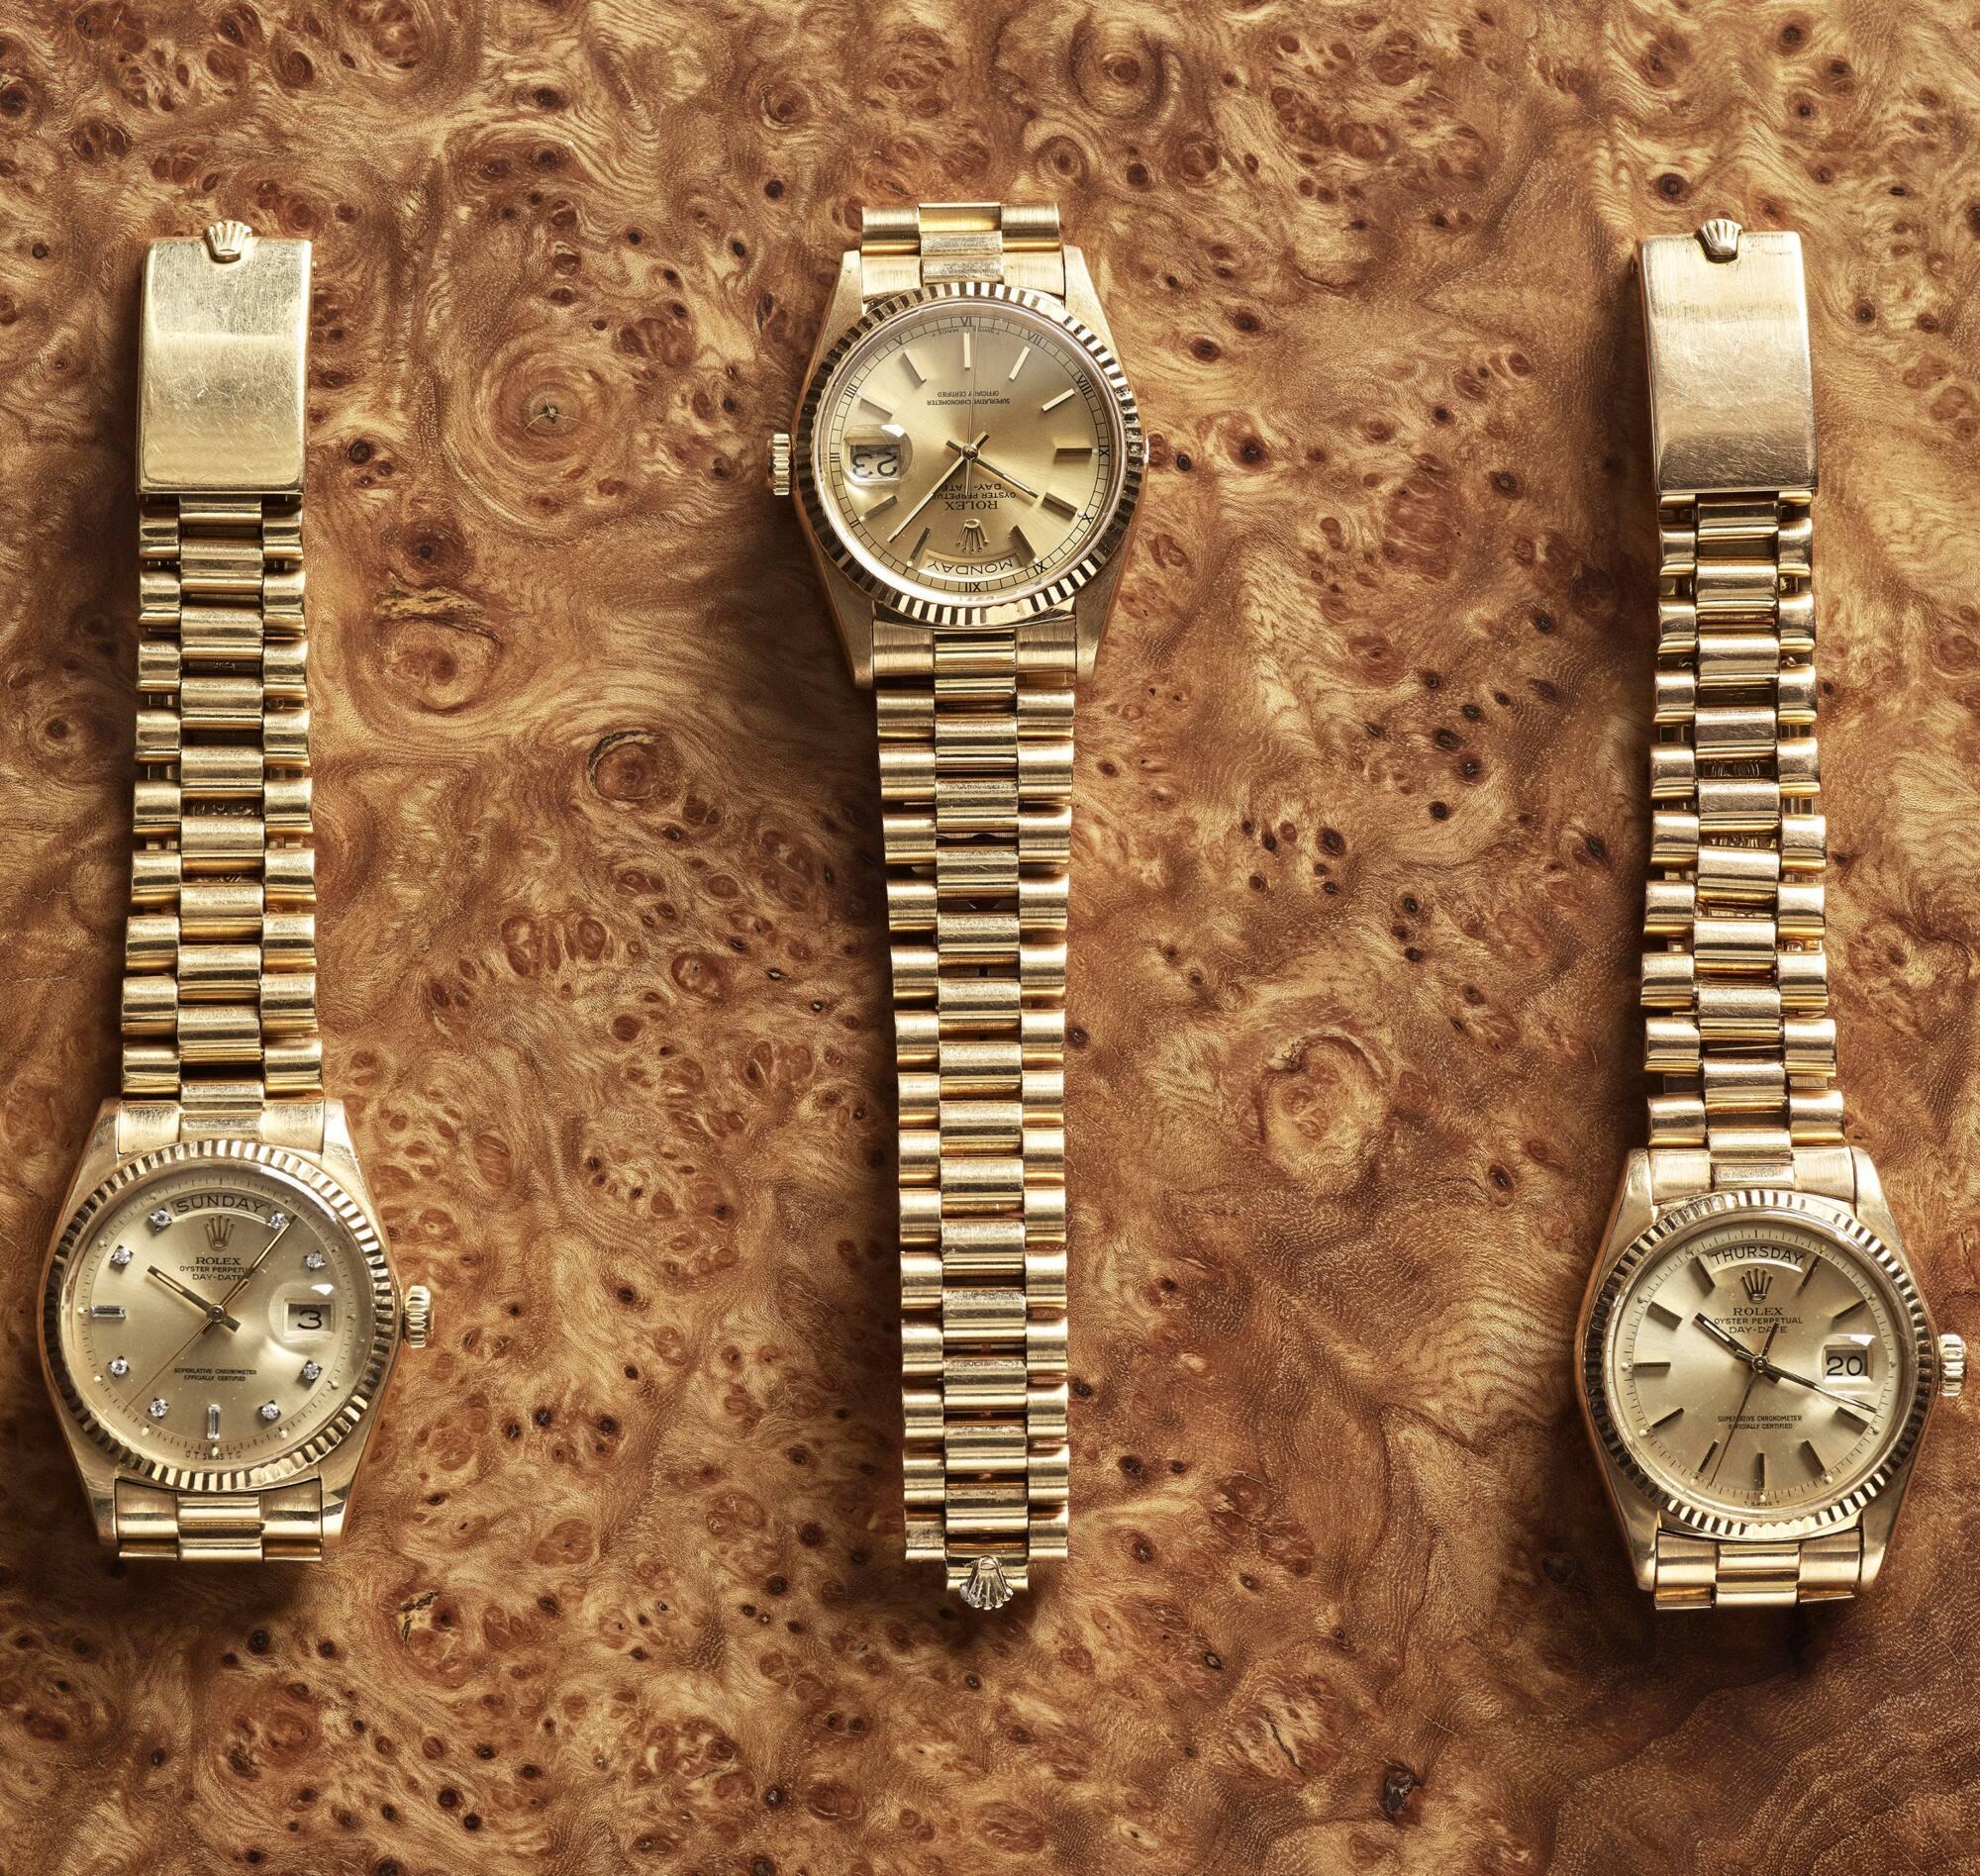 Important Timepieces by Bukowskis - MondaniWeb